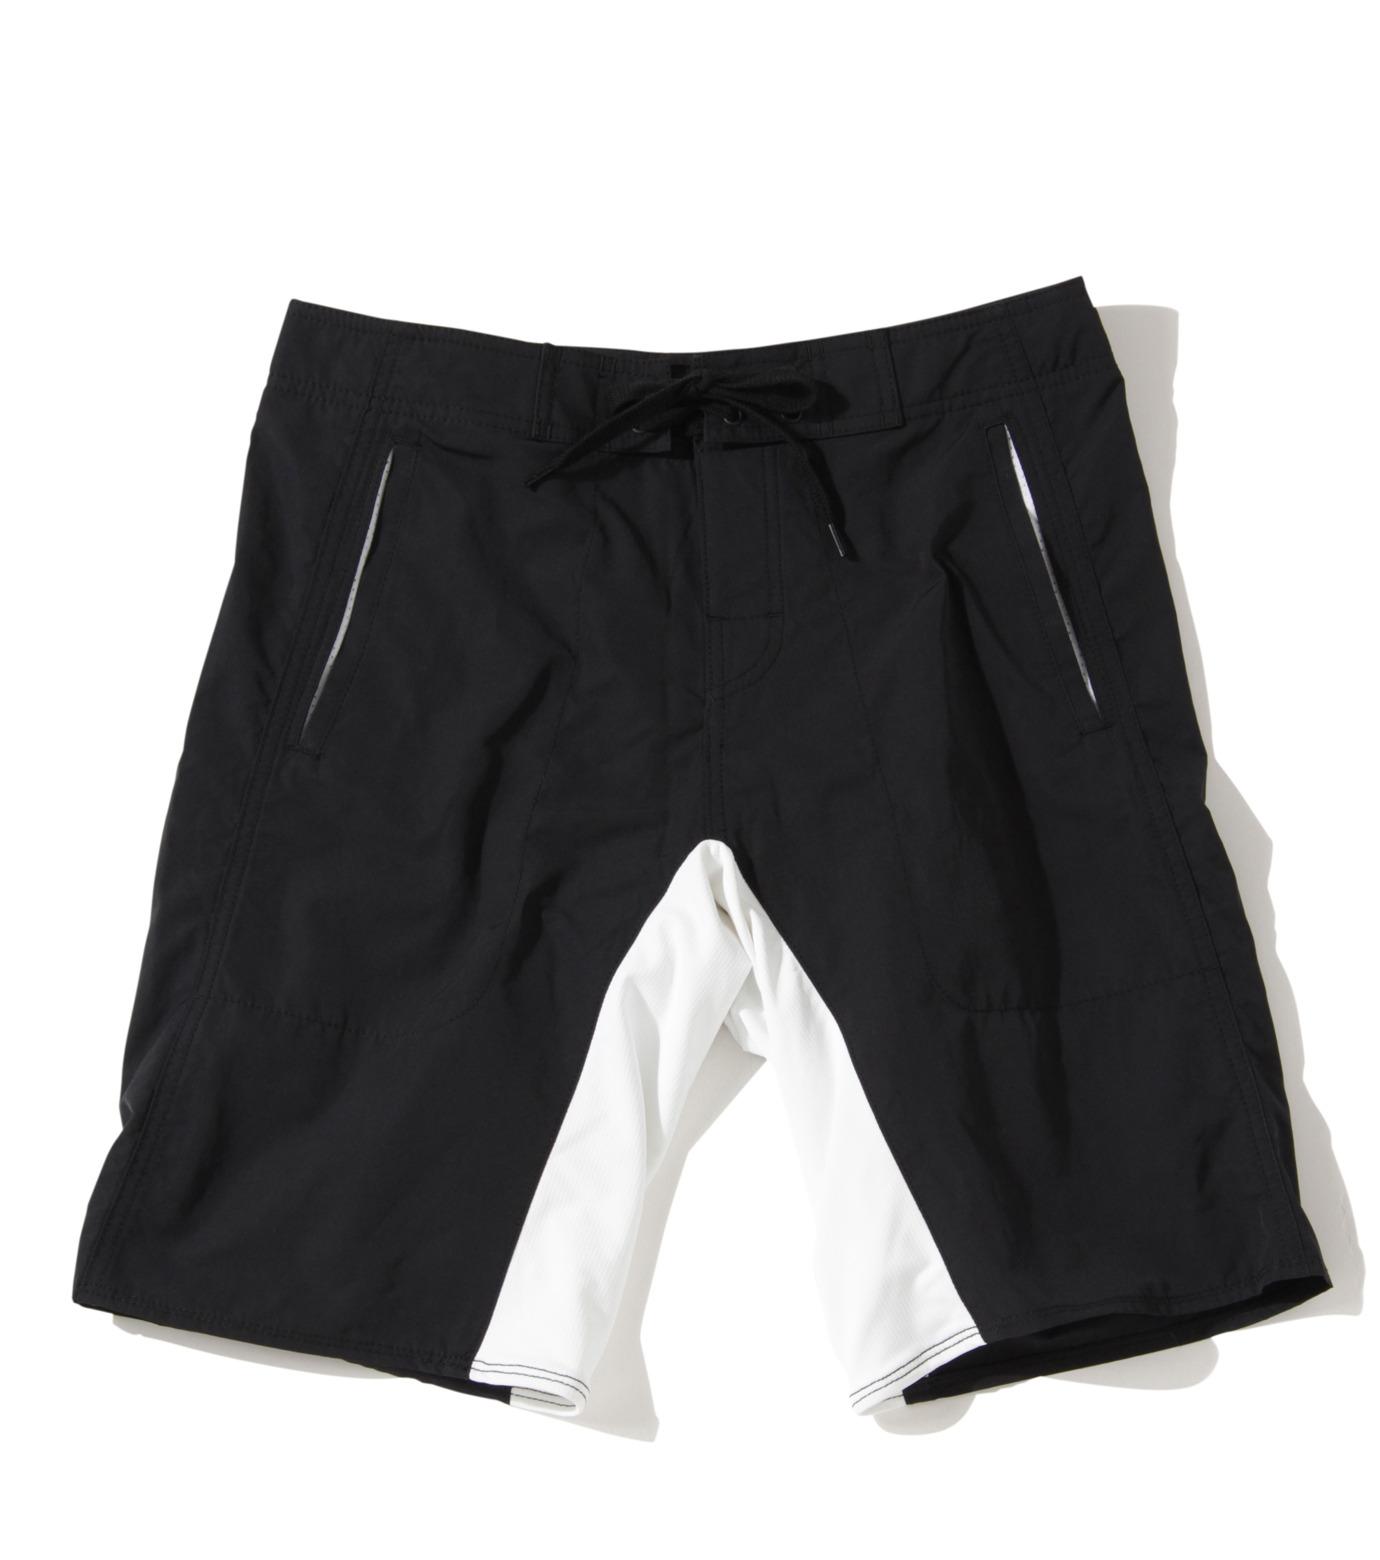 TWO TWO ONE(トゥートゥーワン)のSurf shorts long-WHITE(SWIMWEAR/SWIMWEAR)-15N948002-4 拡大詳細画像1